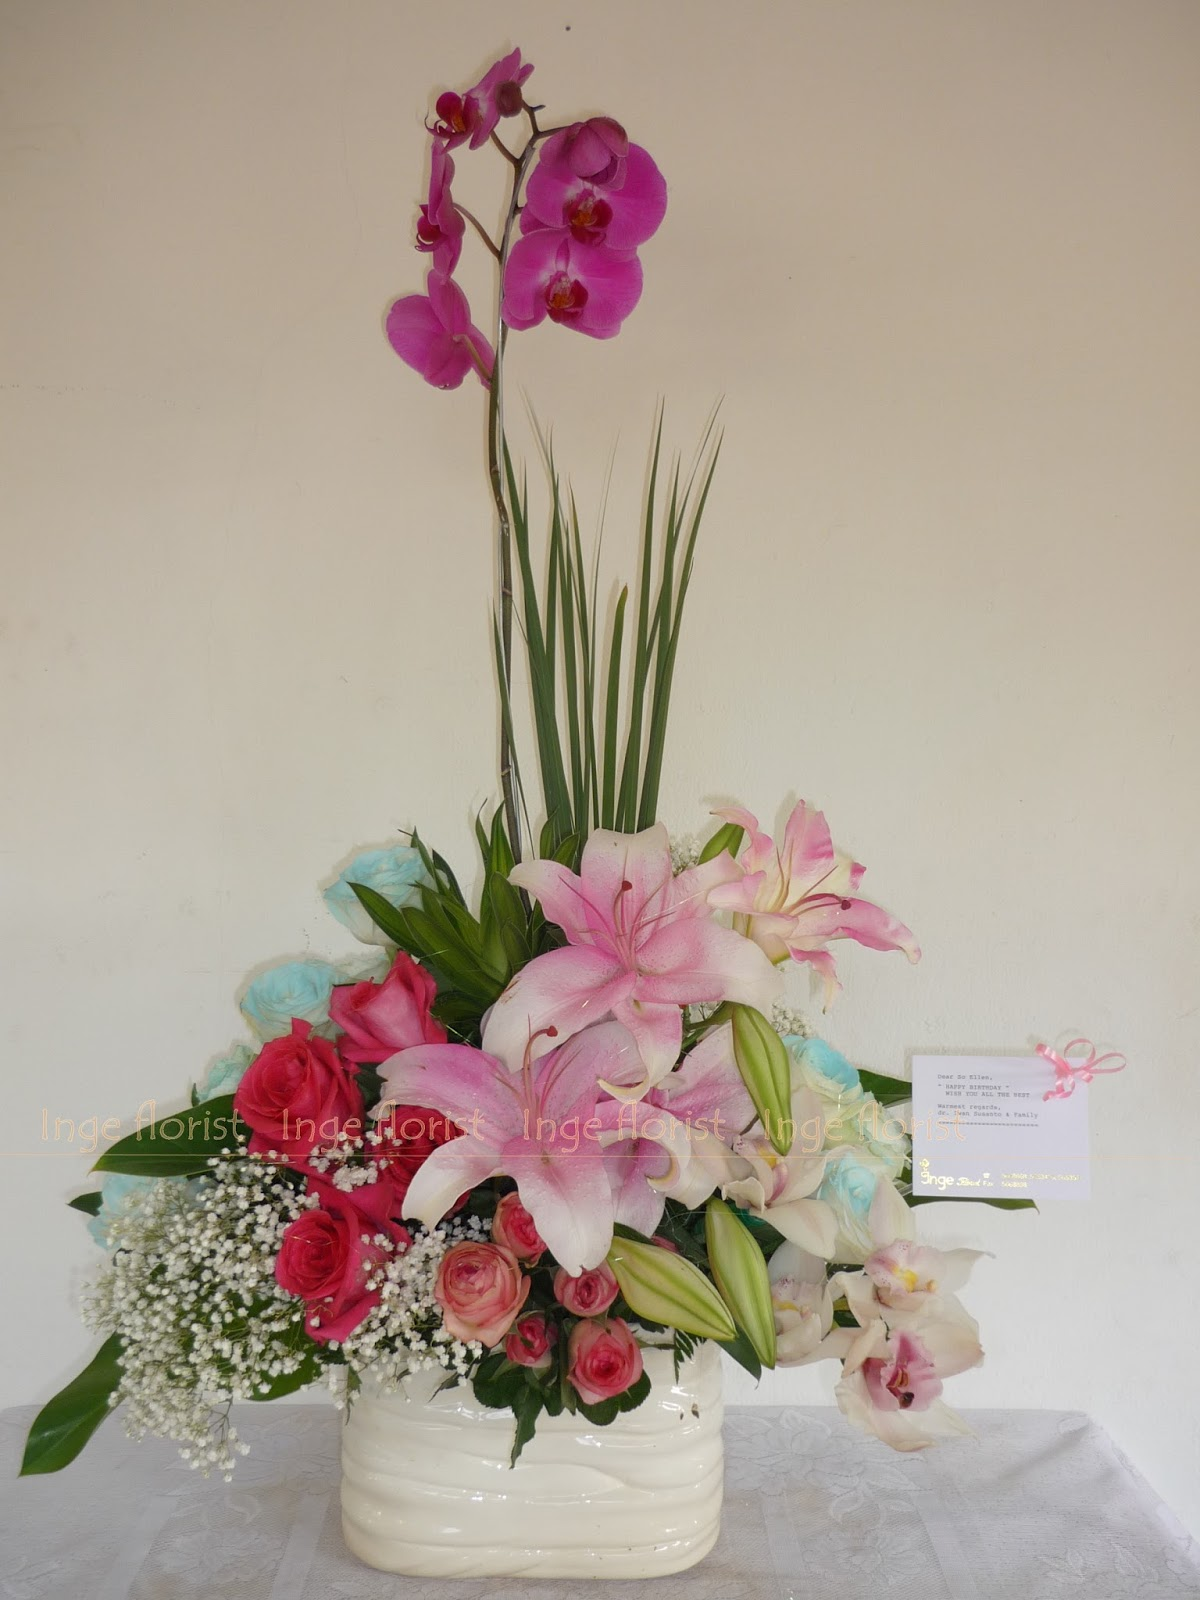 Bunga Meja Toko Cikarang Jual Karangan Rangkaian Impor Flower Sangat Tergantung Dari Kombinasi Yang Dipakai Apakah Menggunakan Segar Maupun Lokal